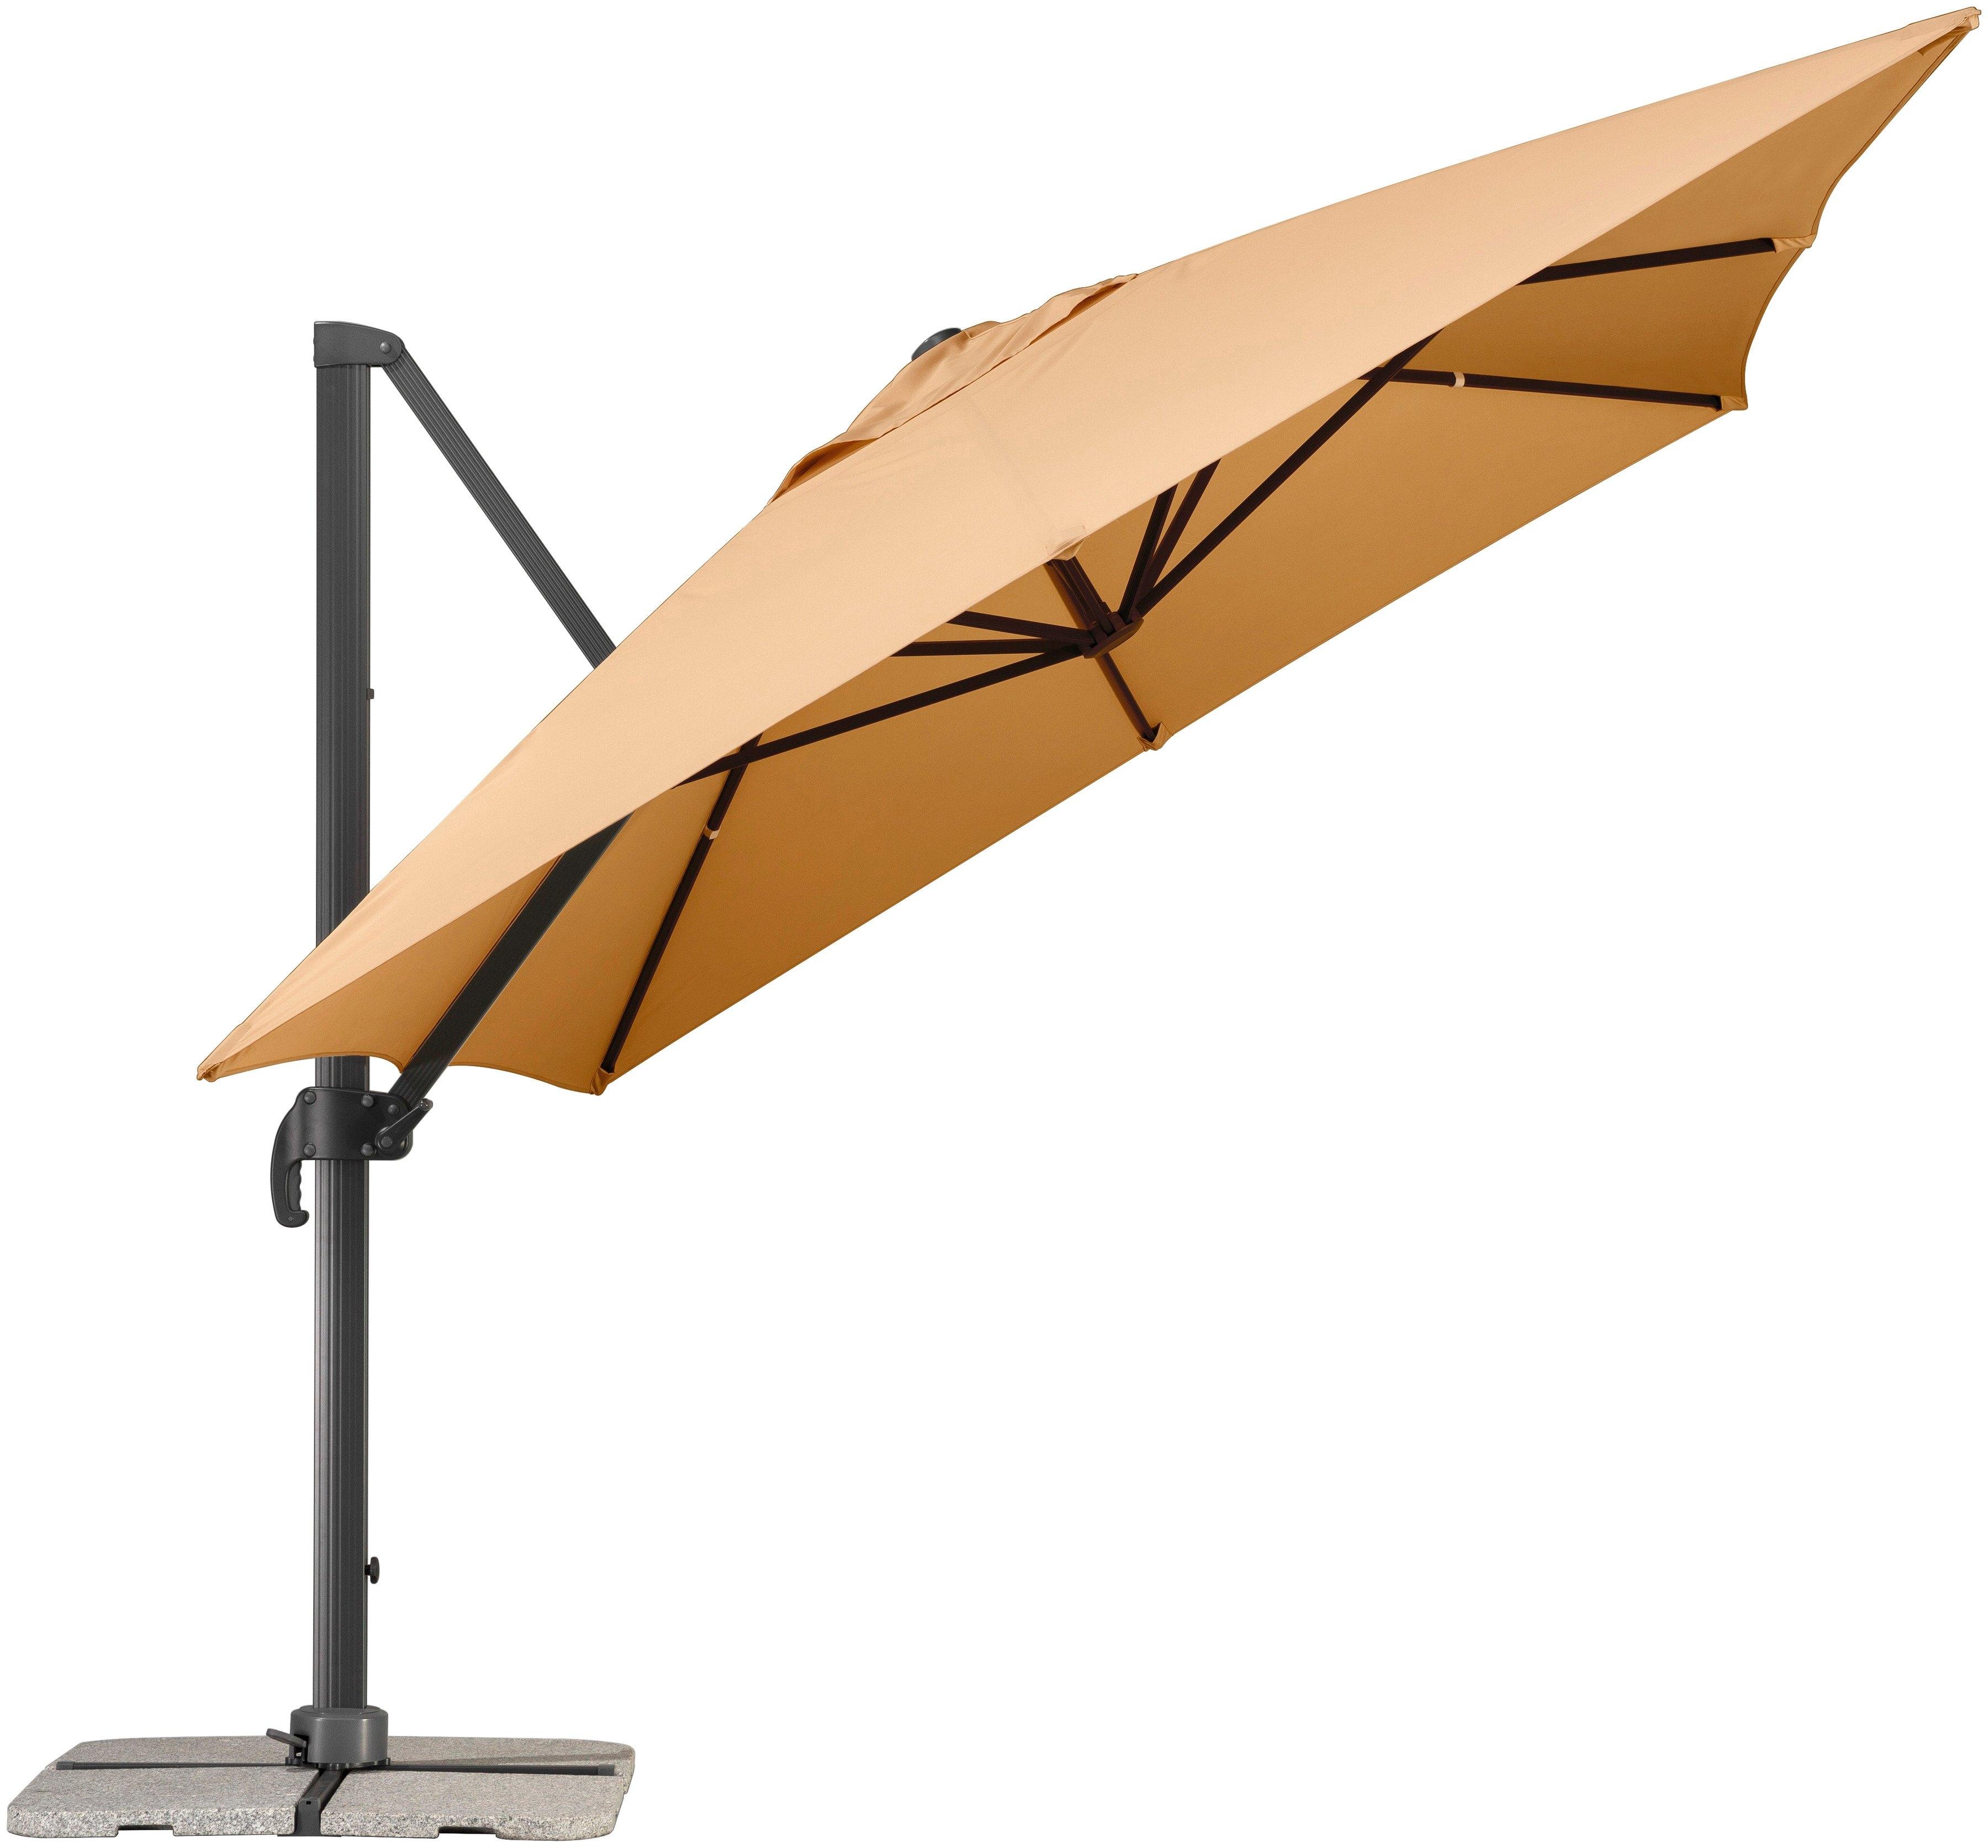 schneider parasols parasol rhodos grande 400x300 cm online kopen otto. Black Bedroom Furniture Sets. Home Design Ideas